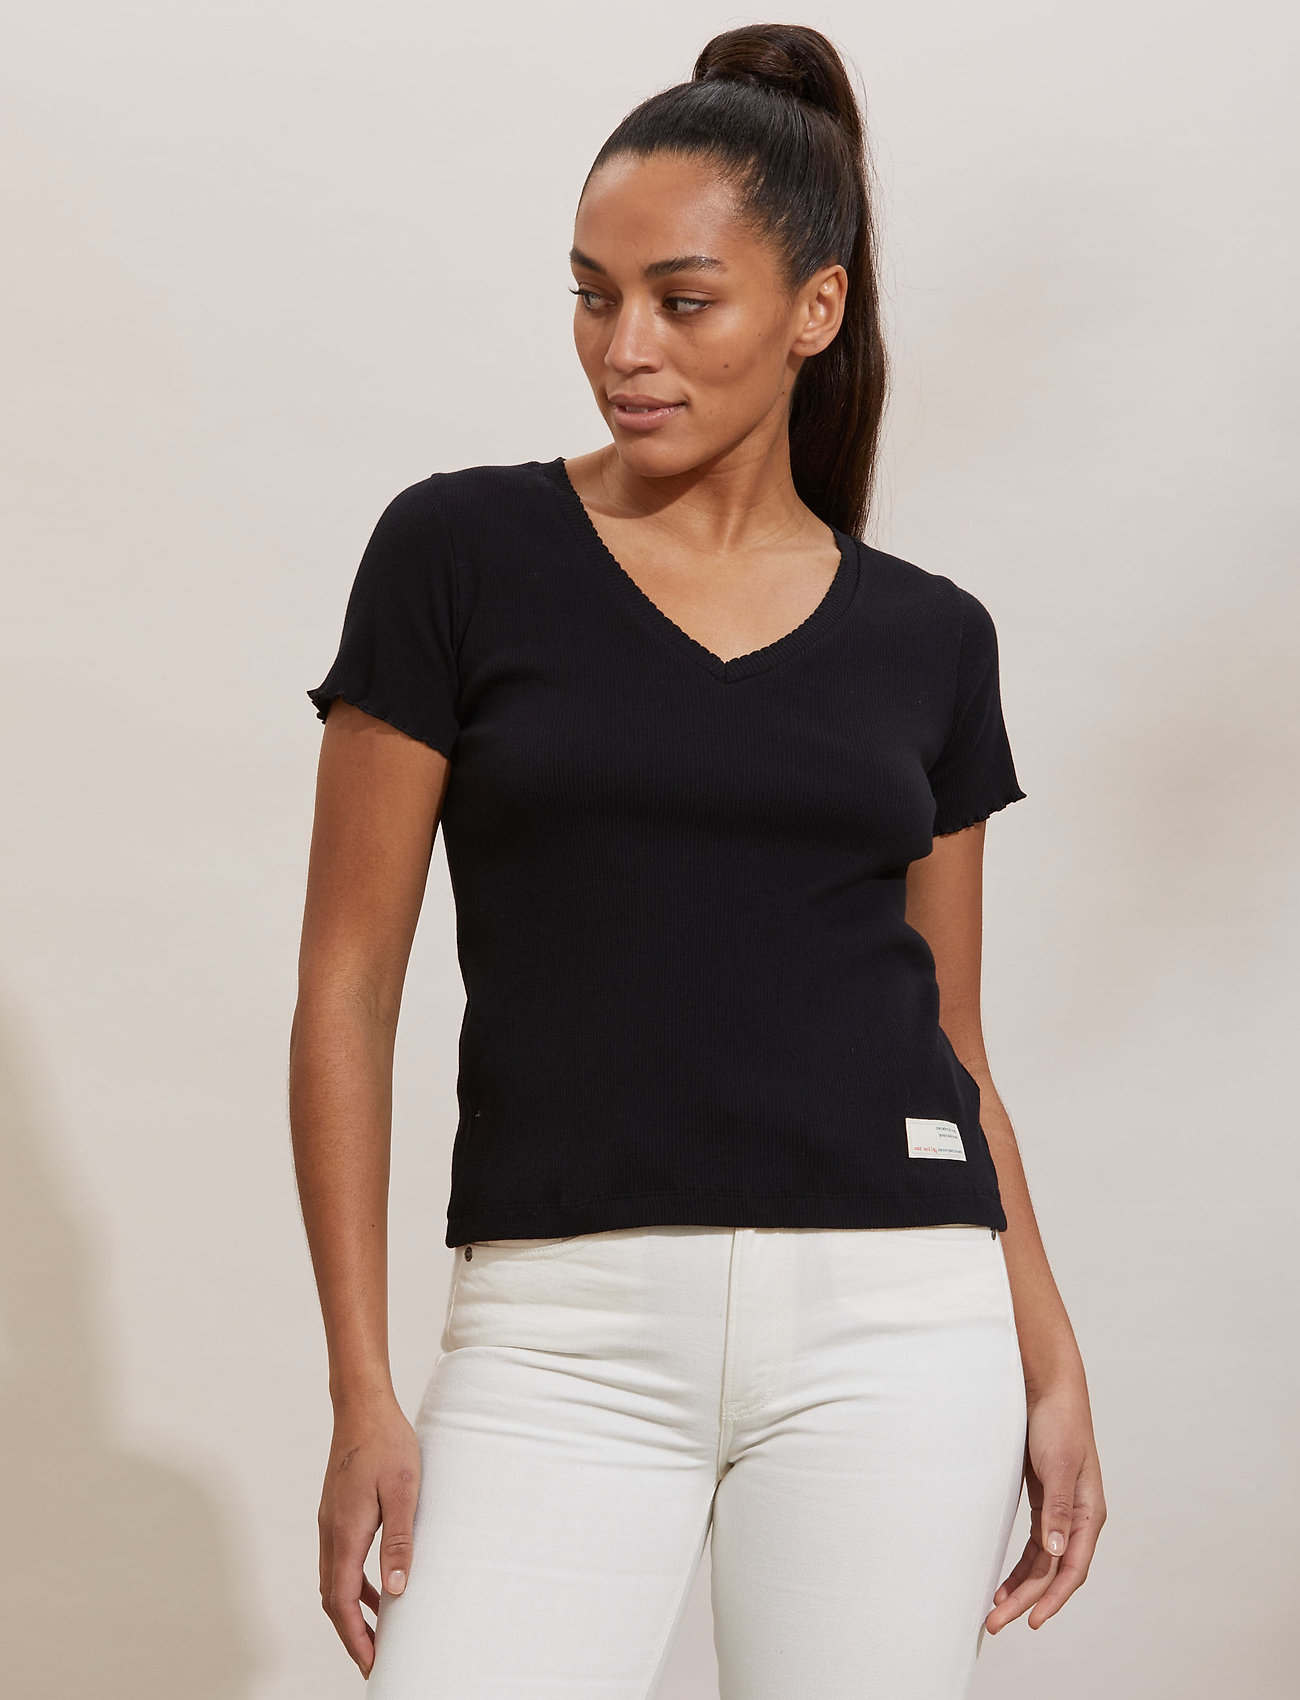 ODD MOLLY - Lynda Top - t-shirts - almost black - 0